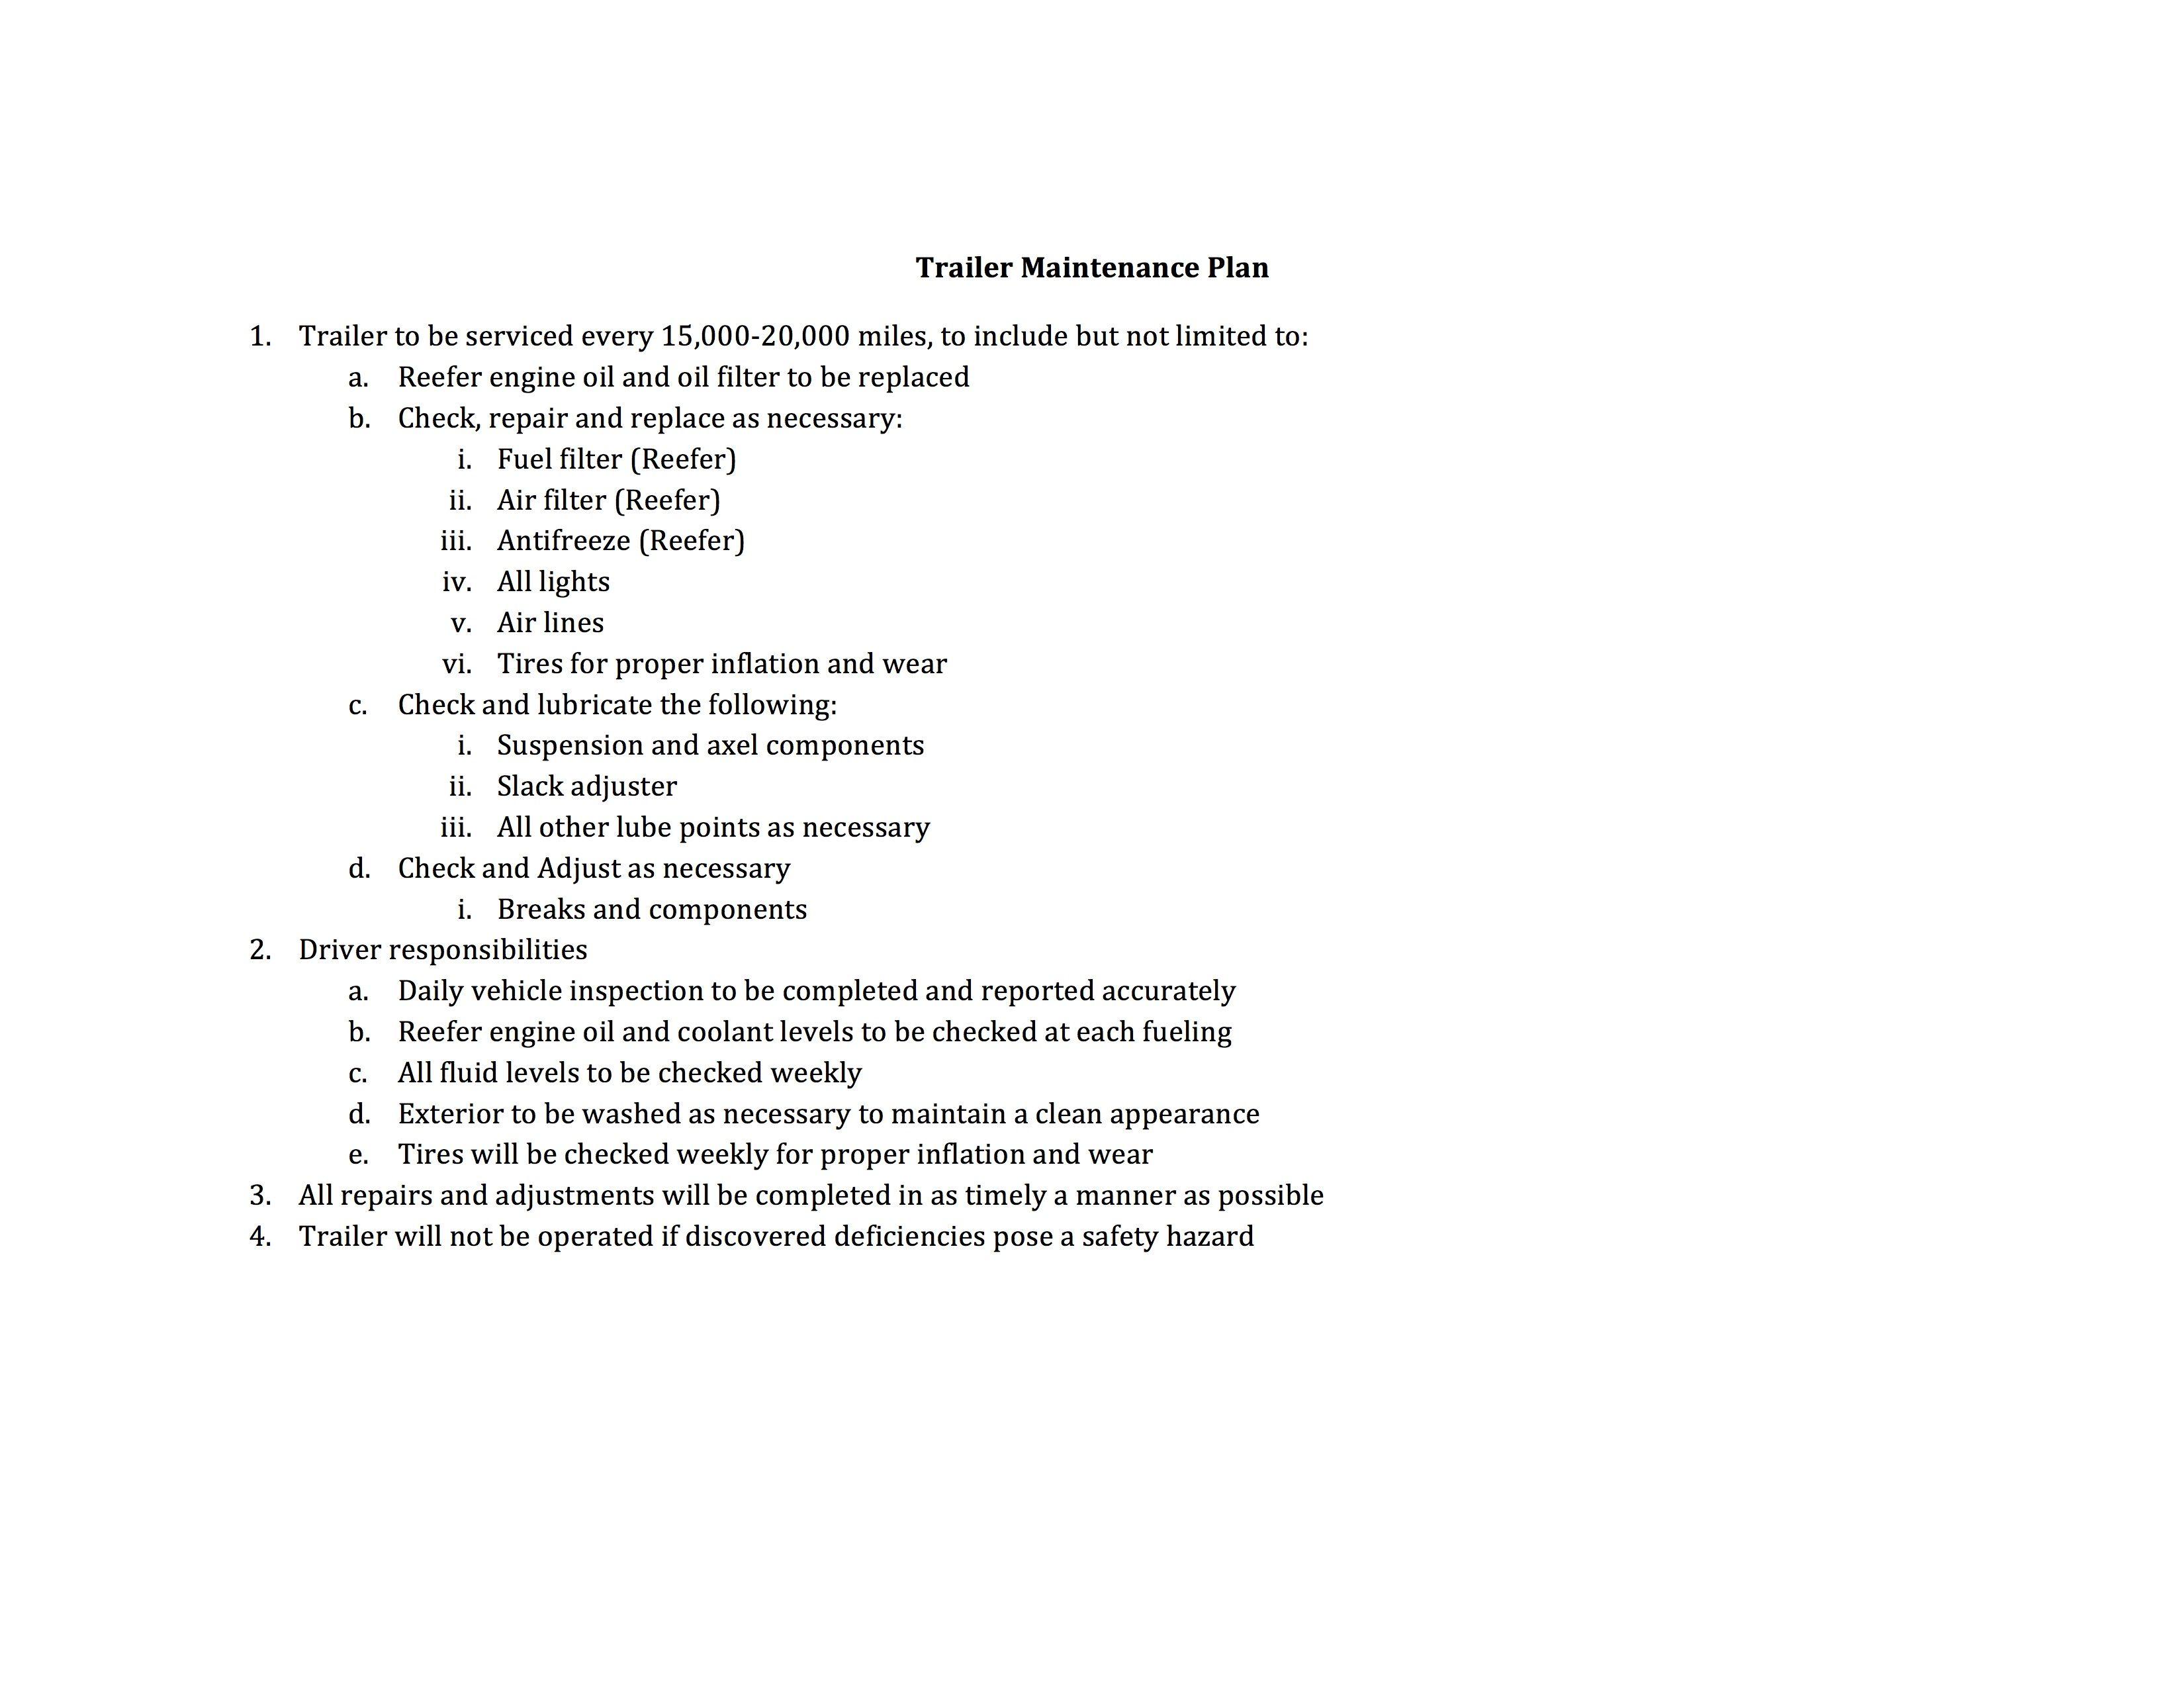 Trialer maintenance plan